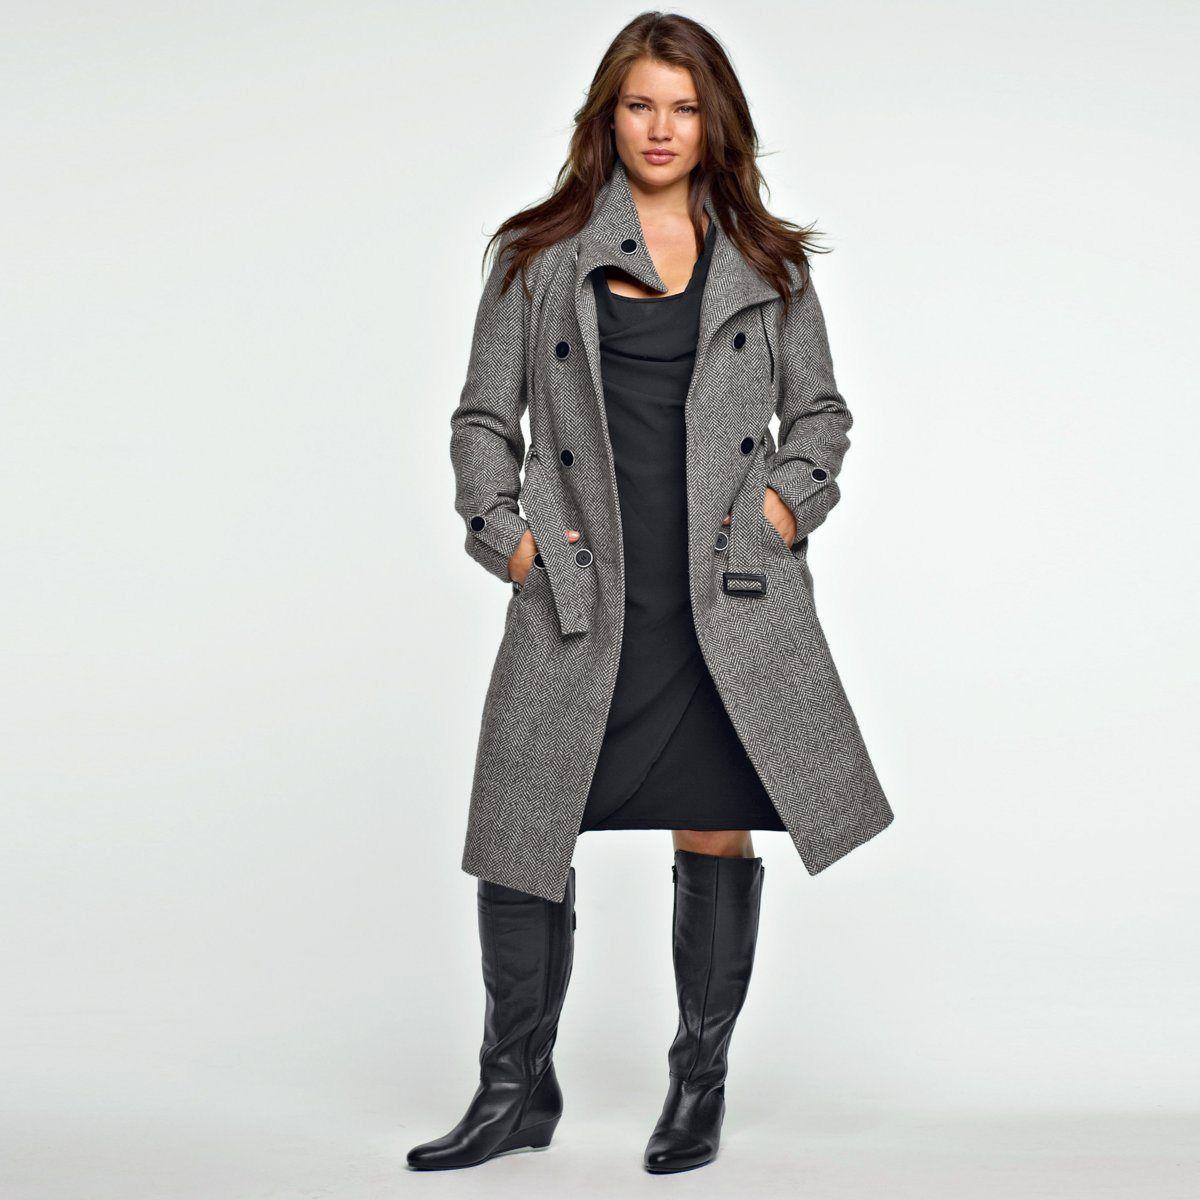 robe en voile pardessus et bottes vive l 39 automne miss. Black Bedroom Furniture Sets. Home Design Ideas